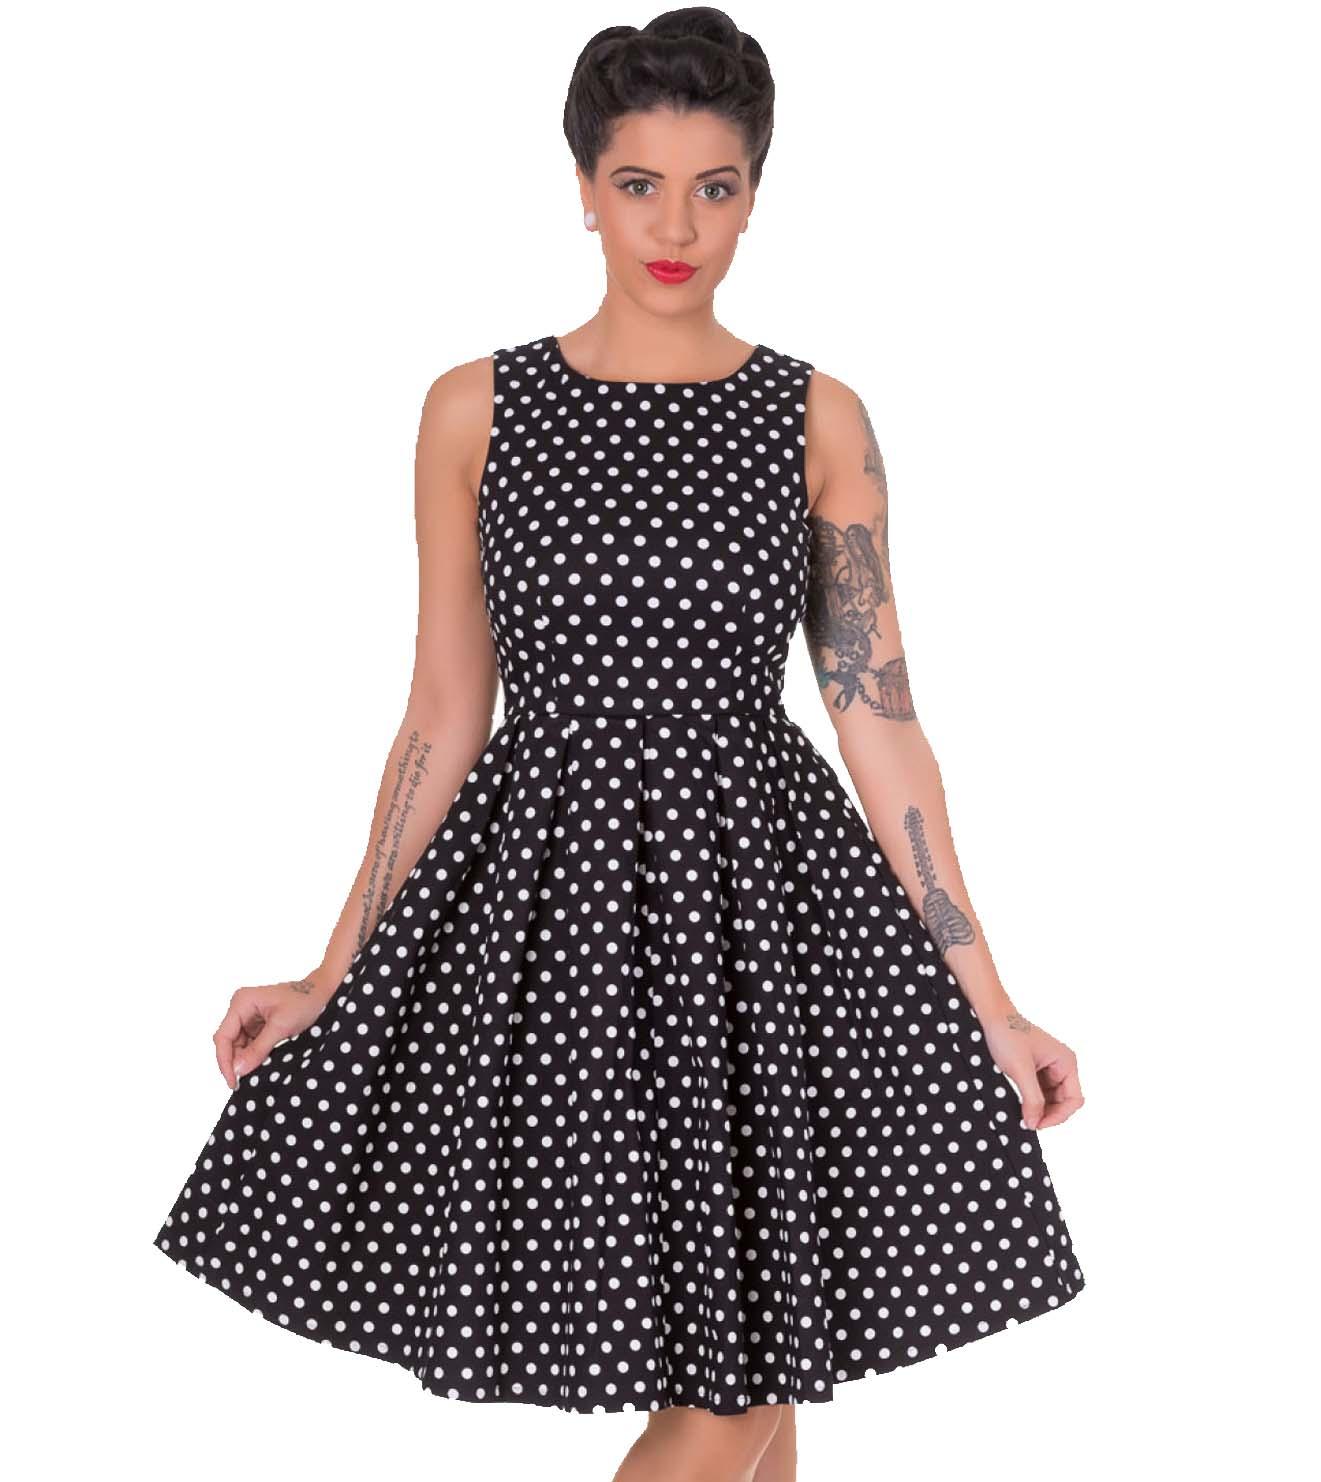 efa464b8221e vintage pin up 50s polka dot φόρεμα Lola σε μαύρο